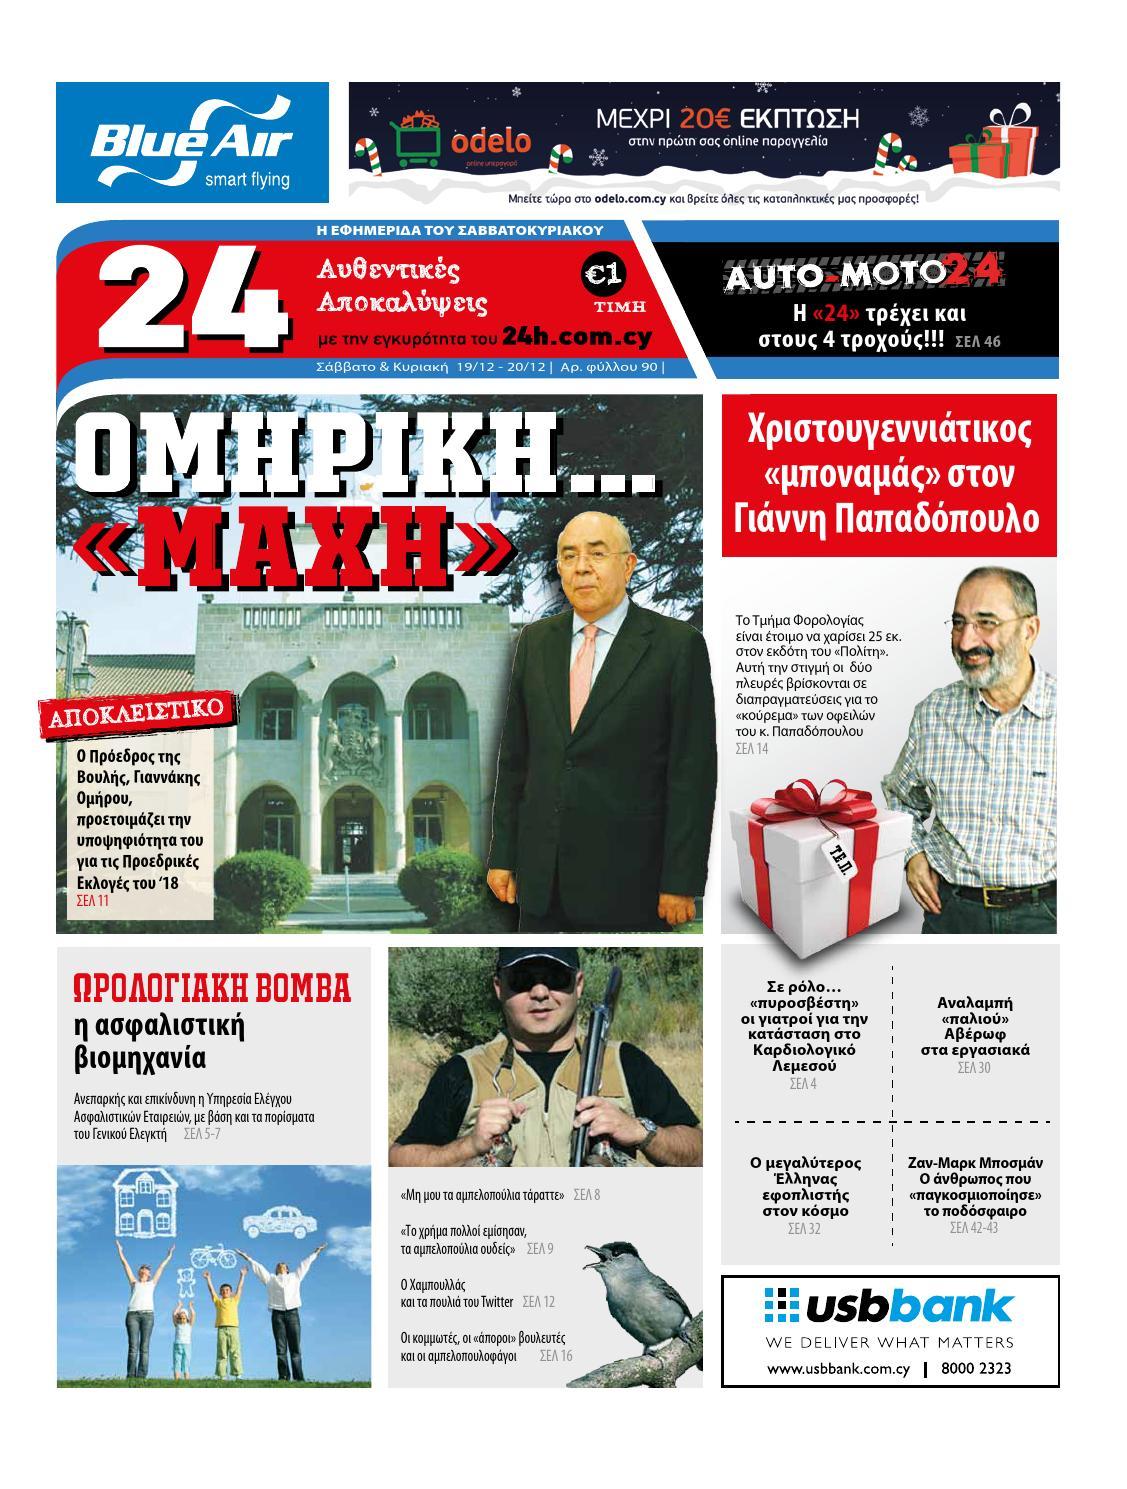 03e923daa50 Εφημερίδα 24 - Φύλλο 90 - 19 Δεκεμβρίου 2016 by Newspaper 24 - issuu